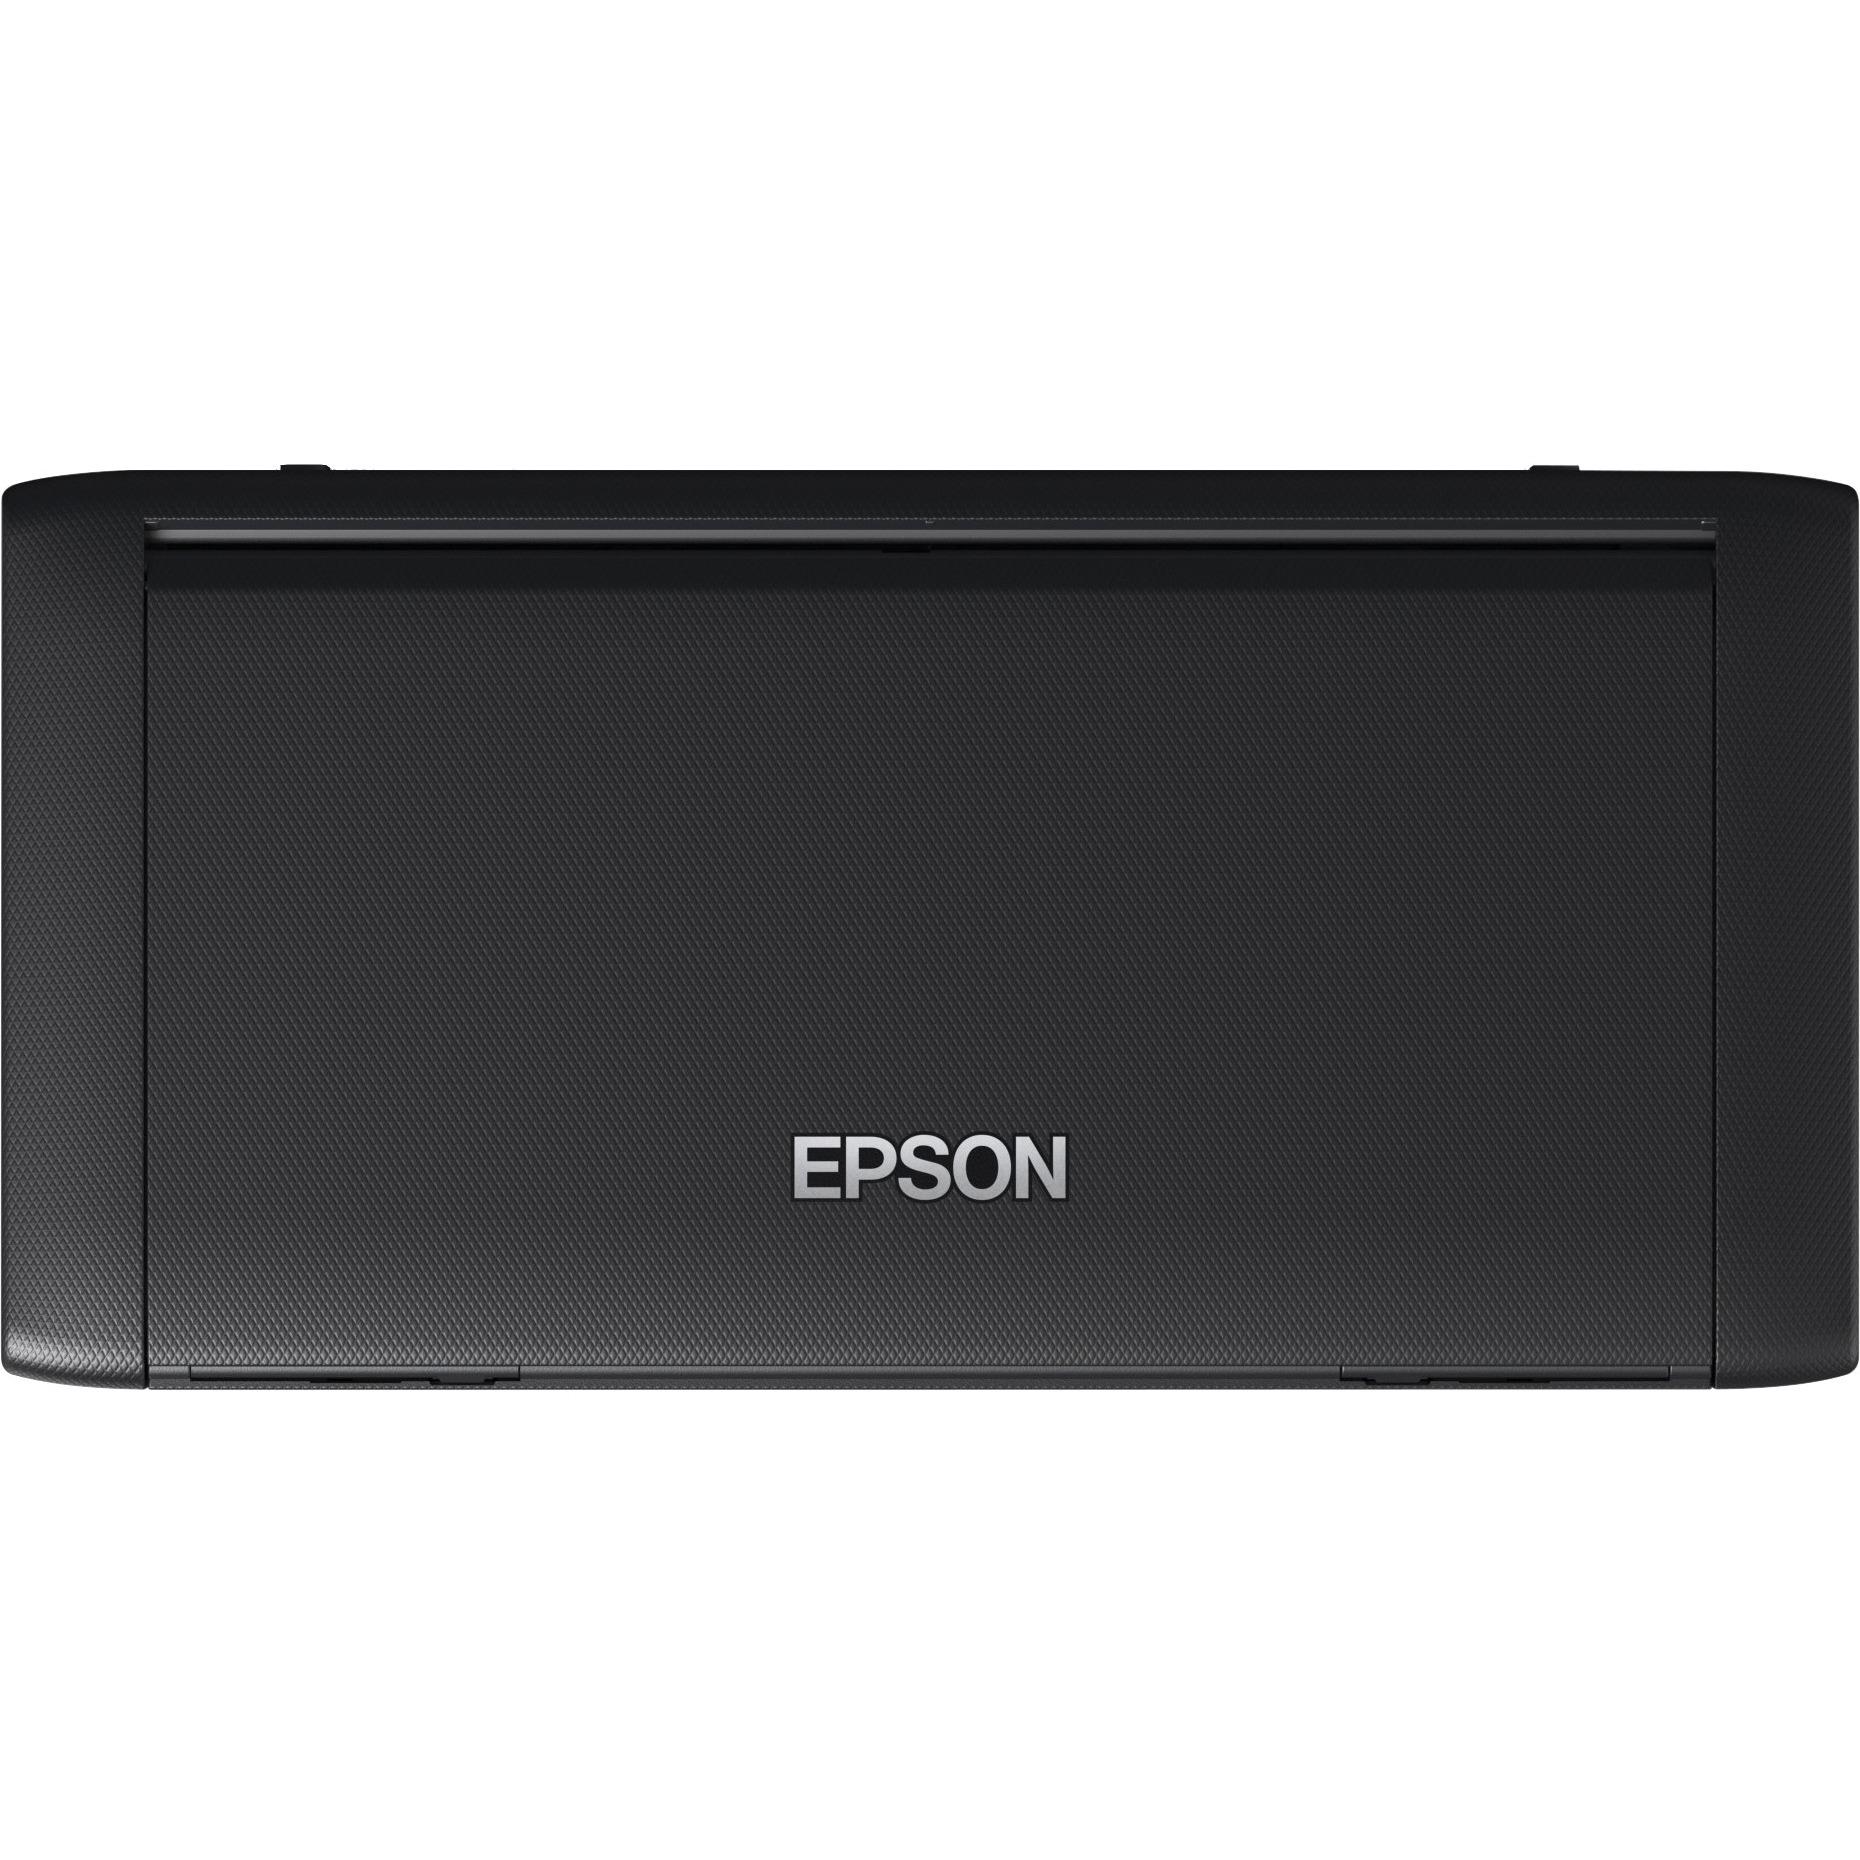 Epson WorkForce WF-100W Inkjet Printer - Colour - 5760 x 1440 dpi Print